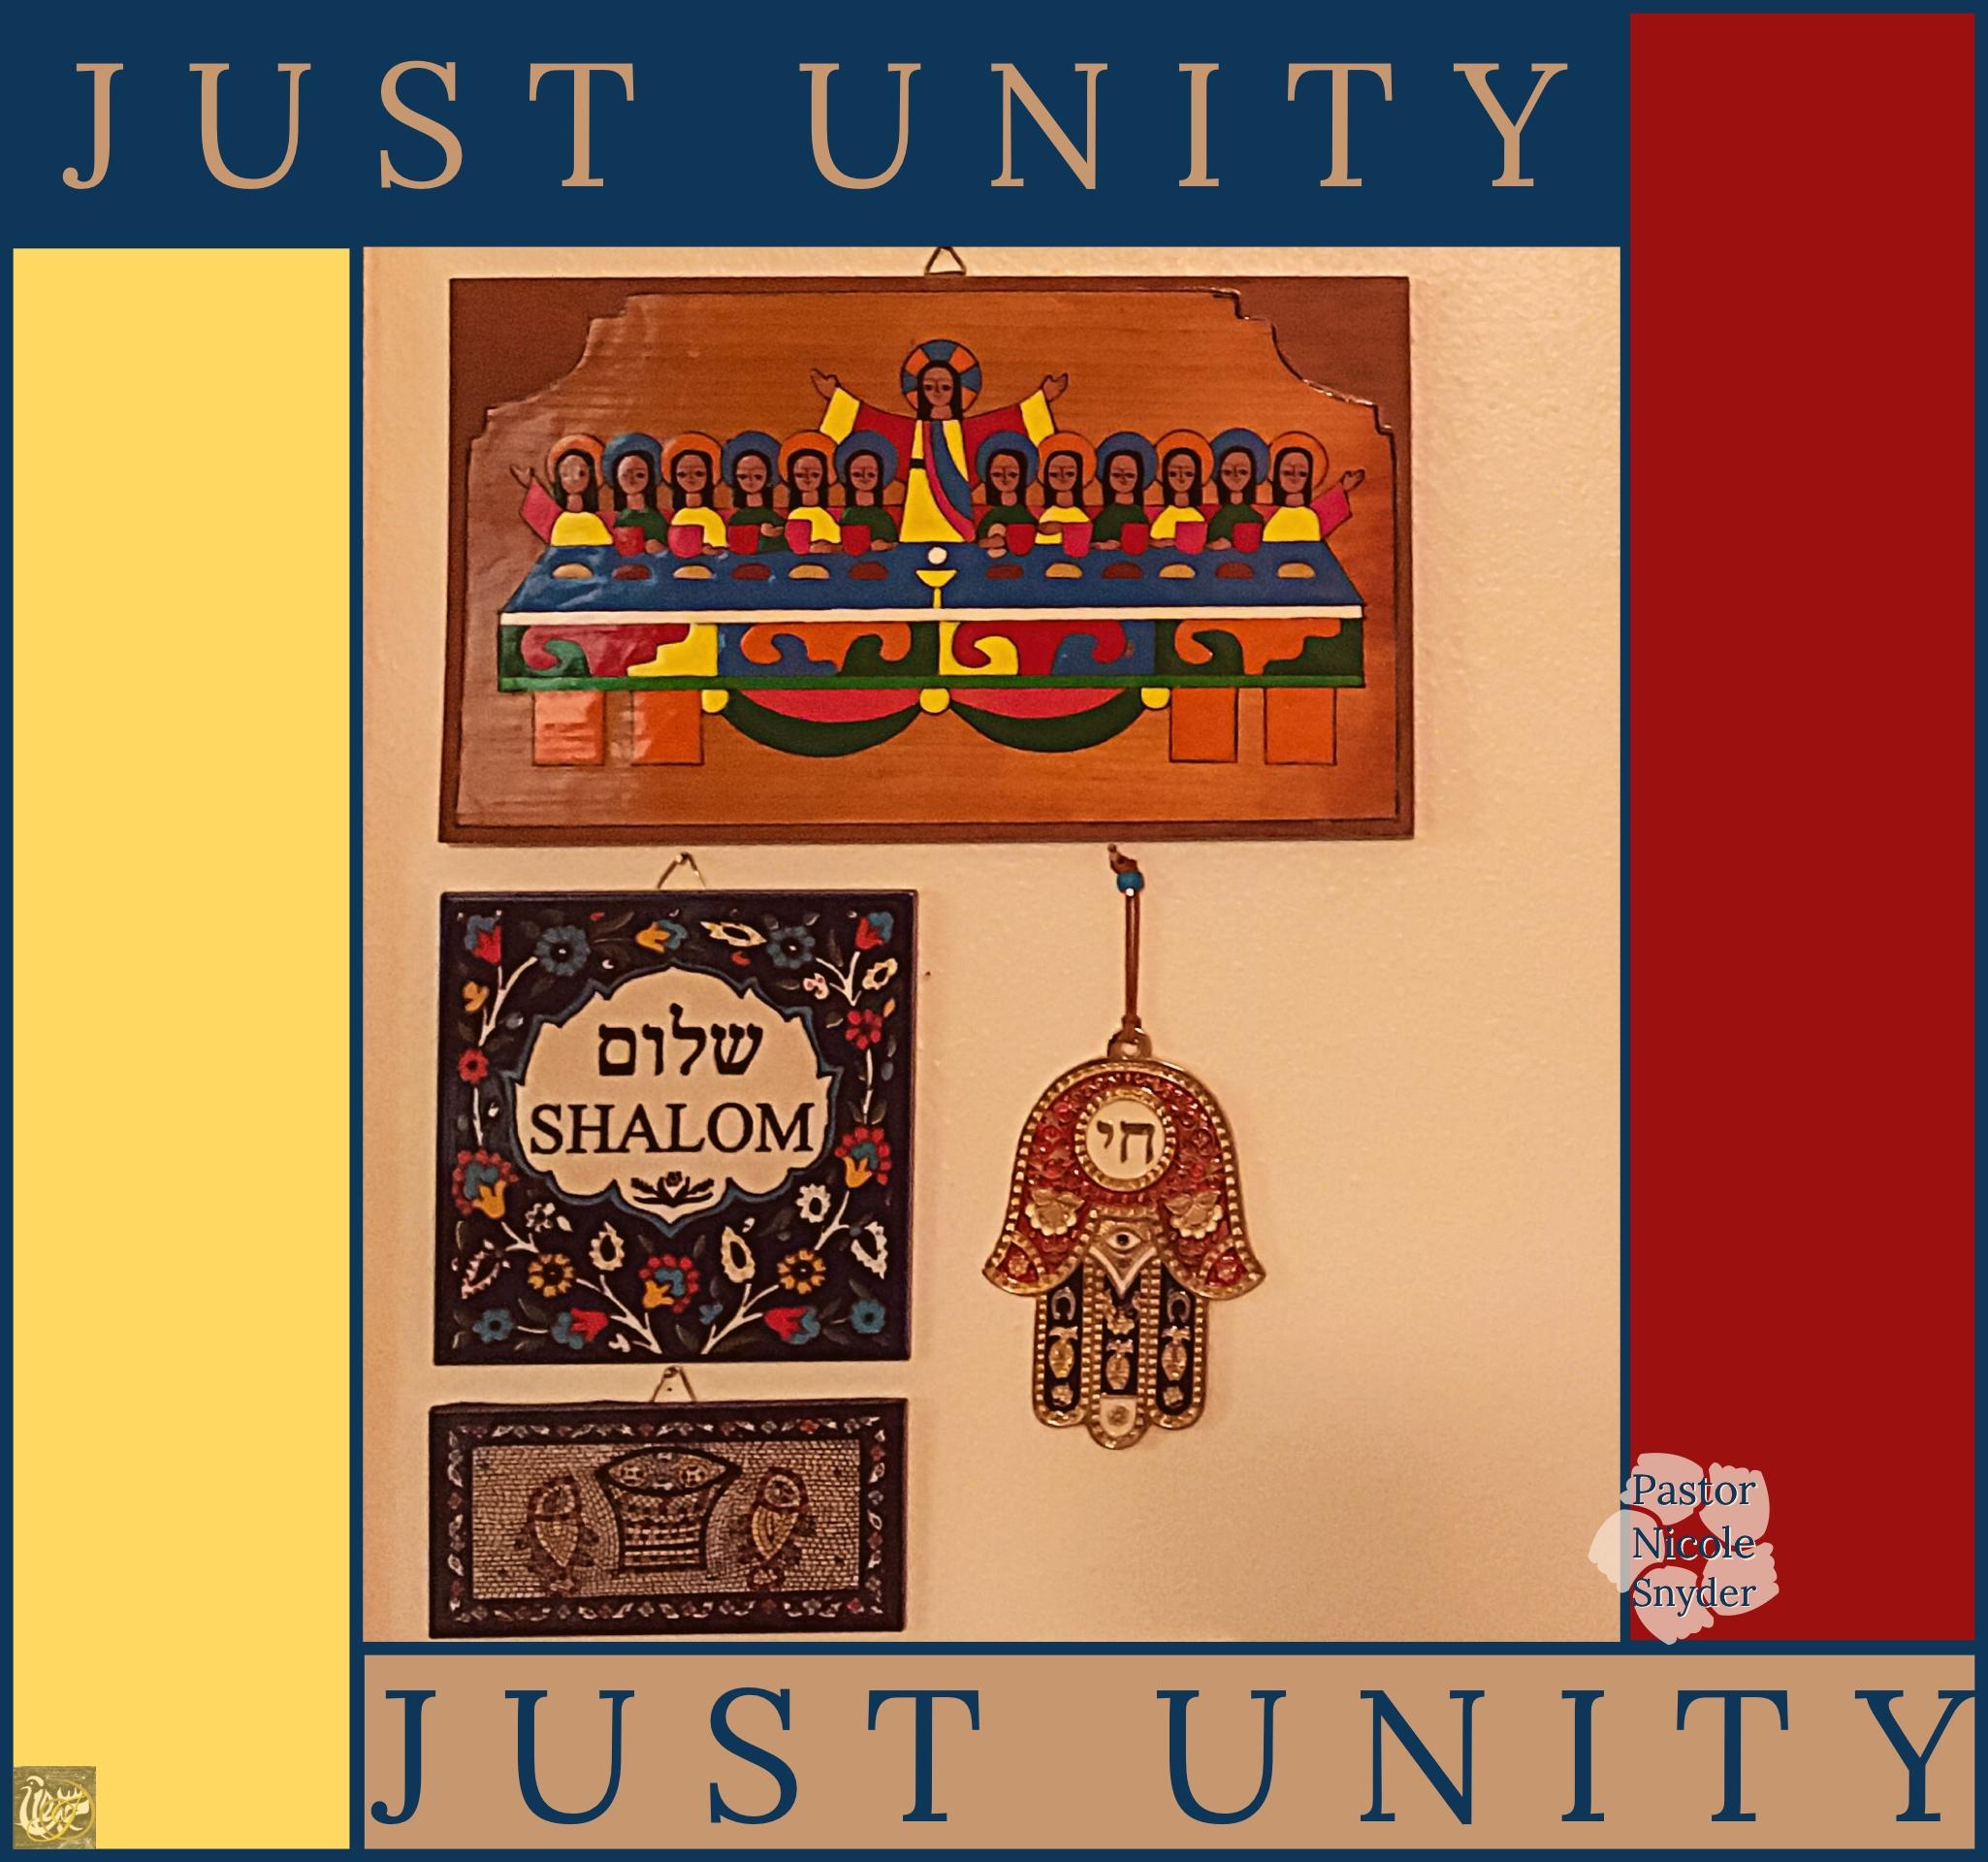 Just Unity